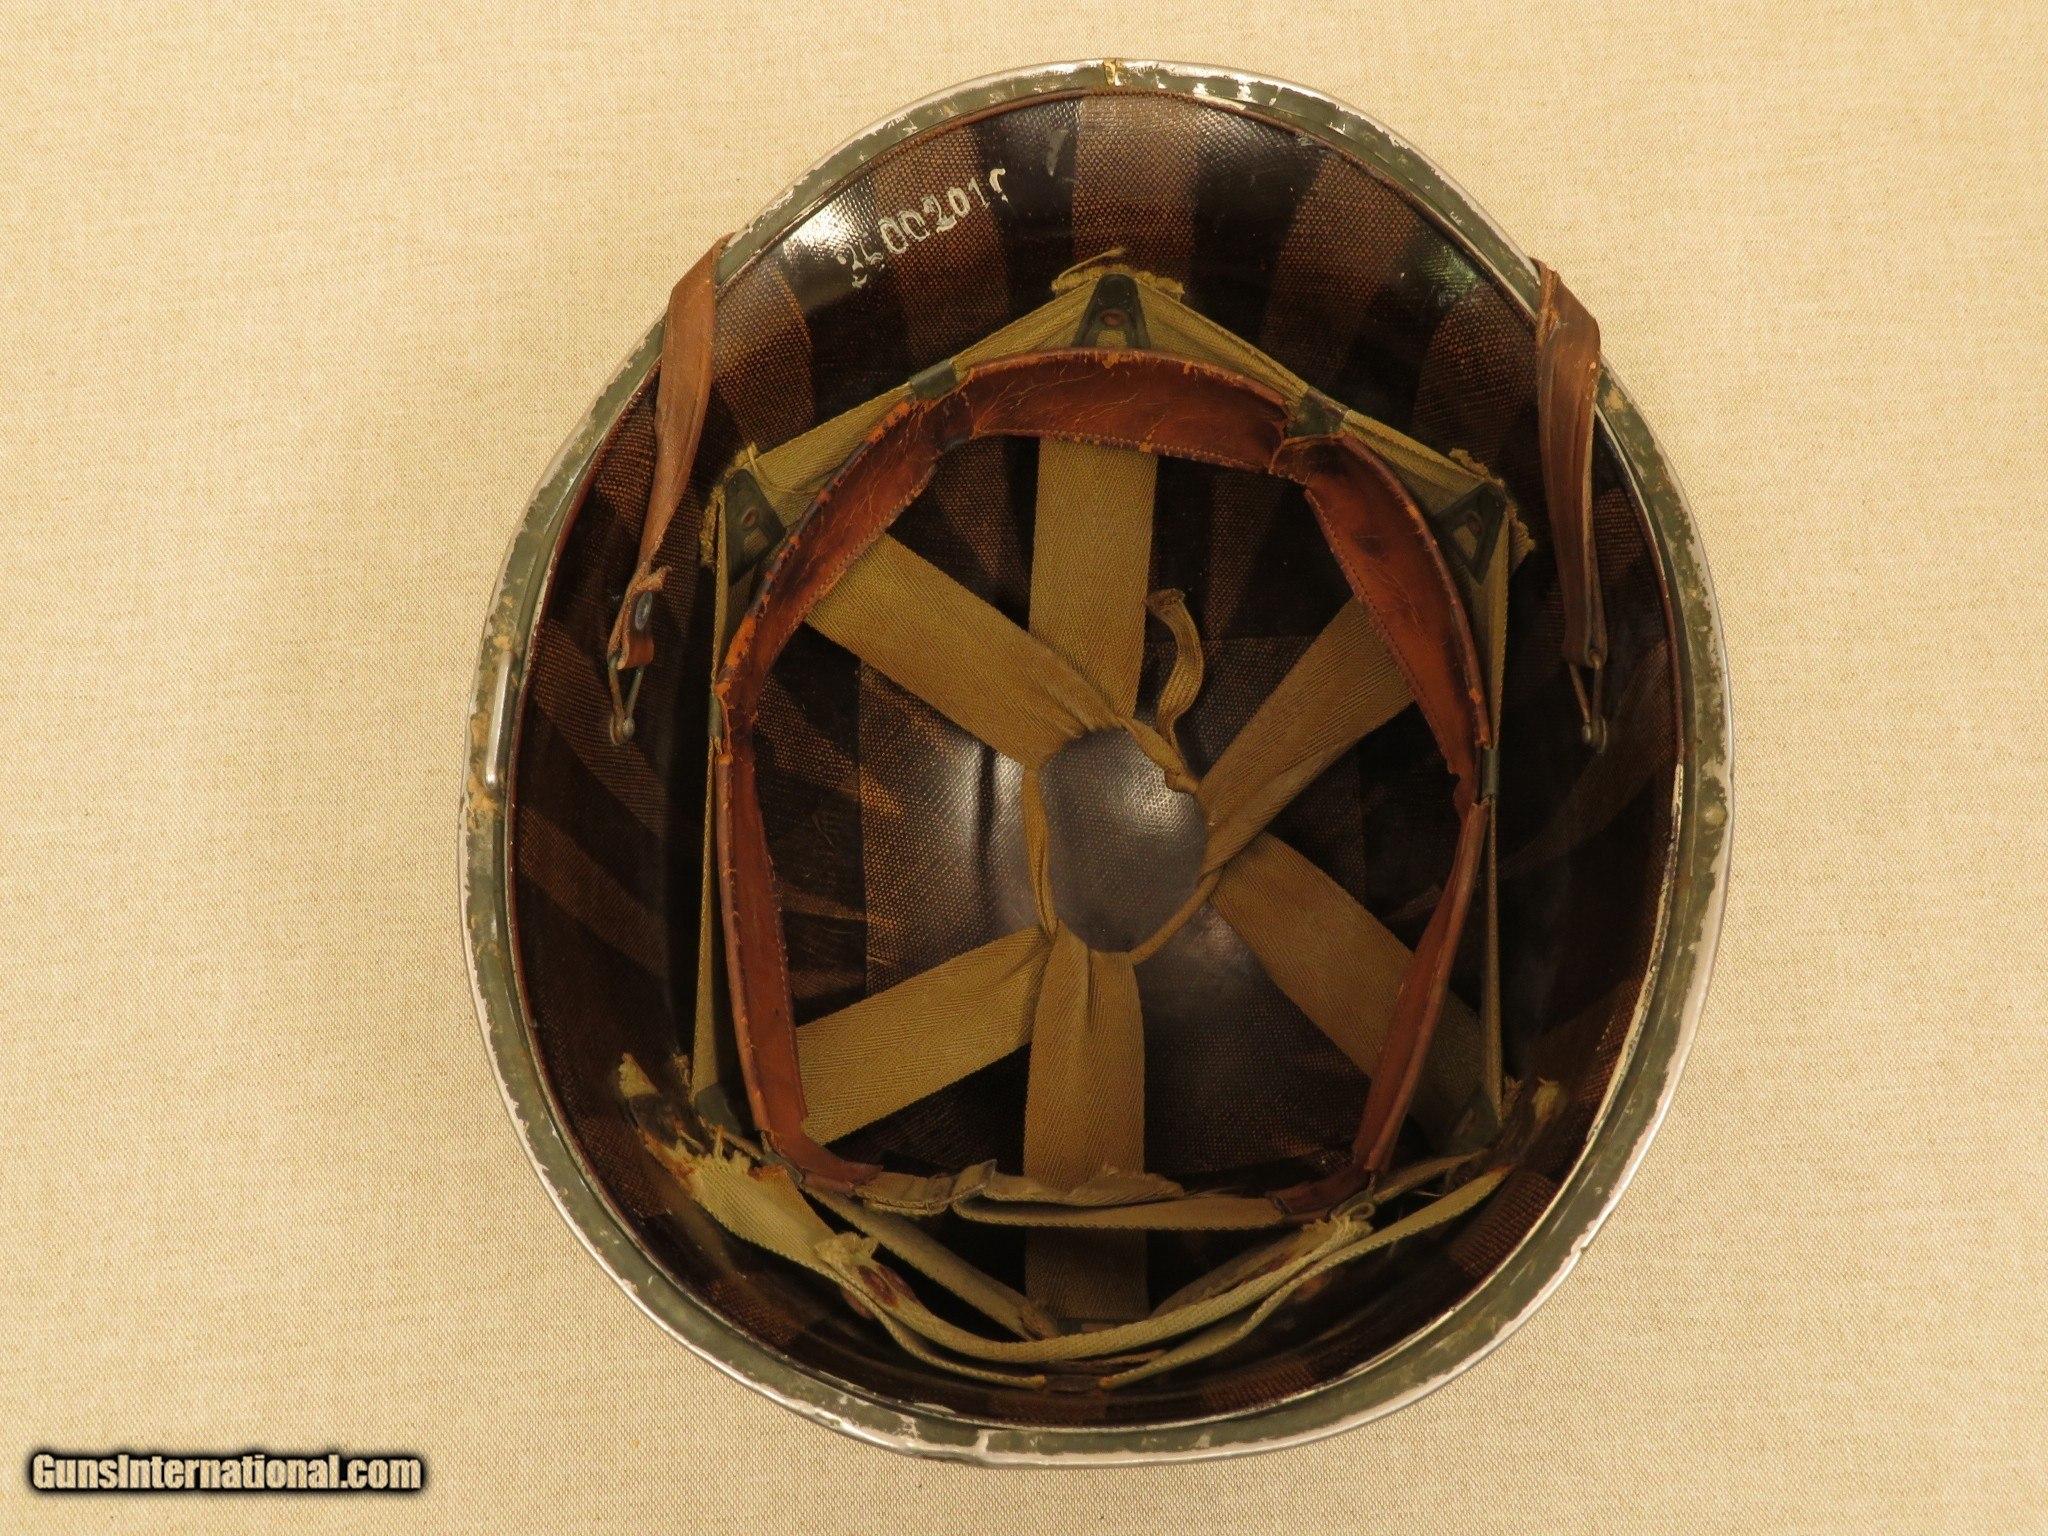 WW2 U S  M1 Helmet from 1st Lt  W  Gerhardt of the 36th